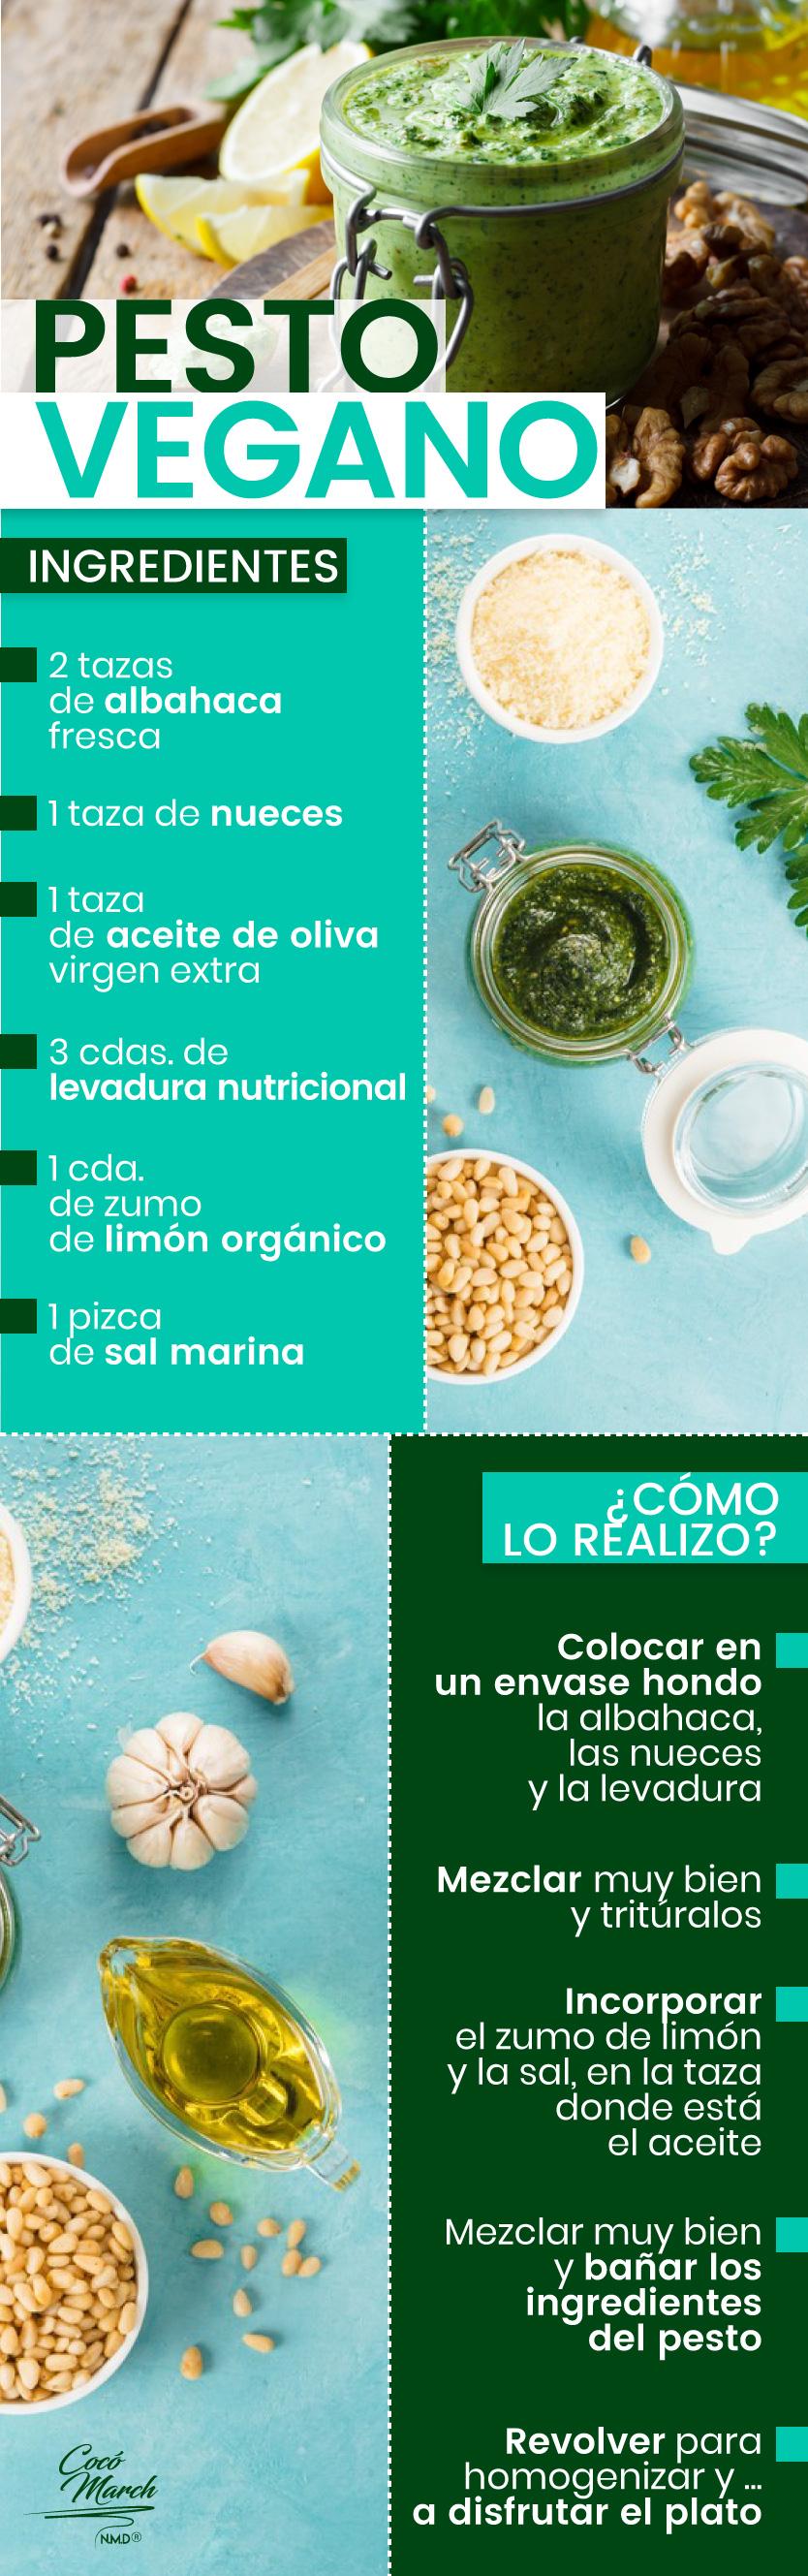 receta-pesto-vegano